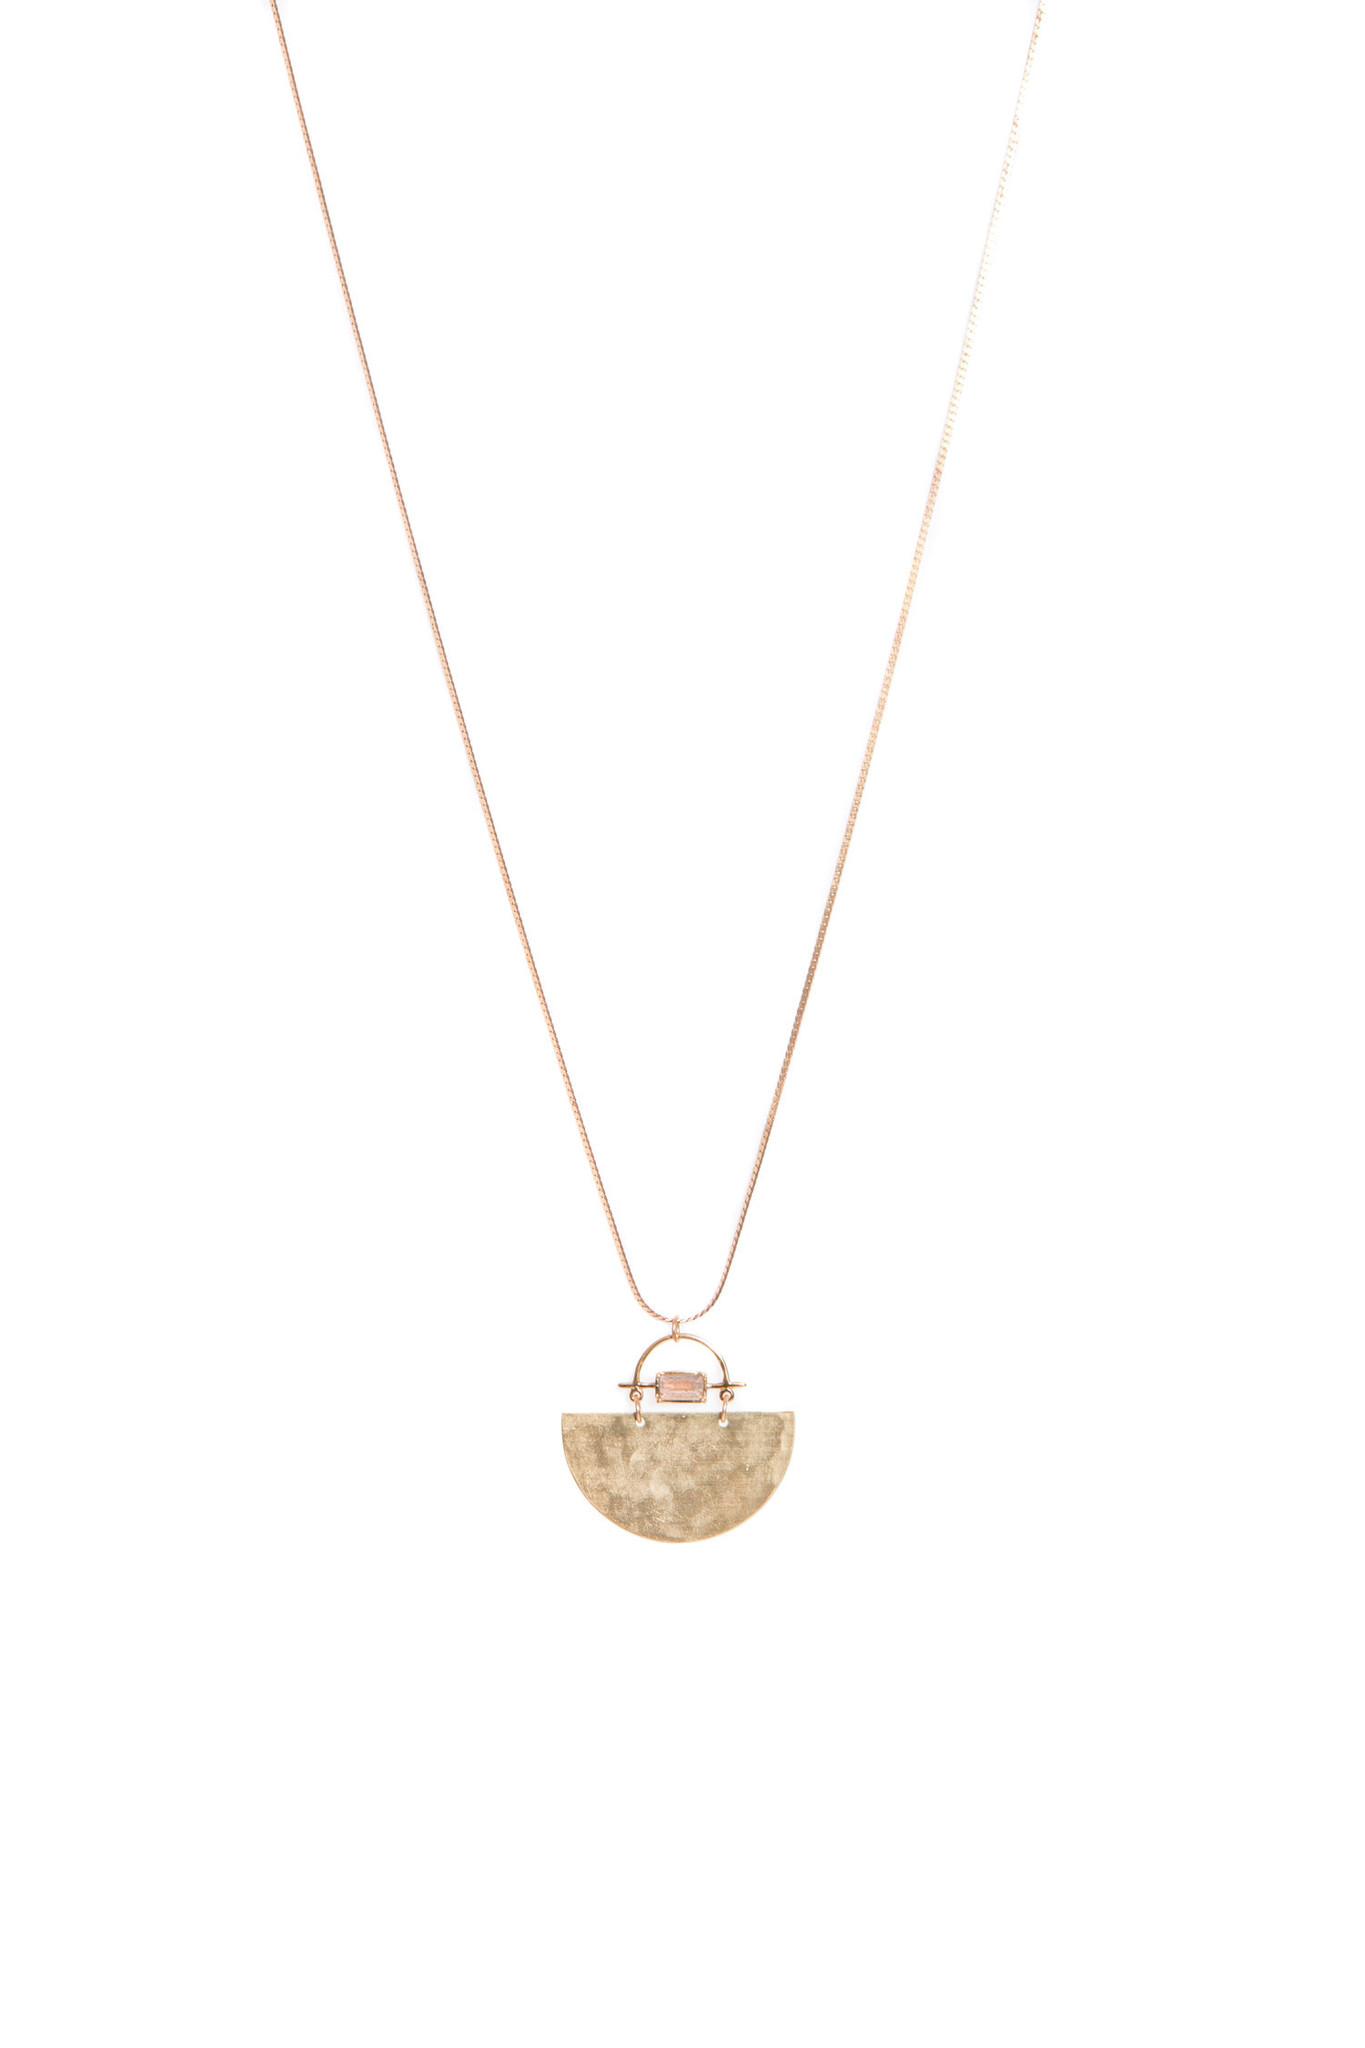 Hailey Gerrits Meridian Necklace- Labradorite